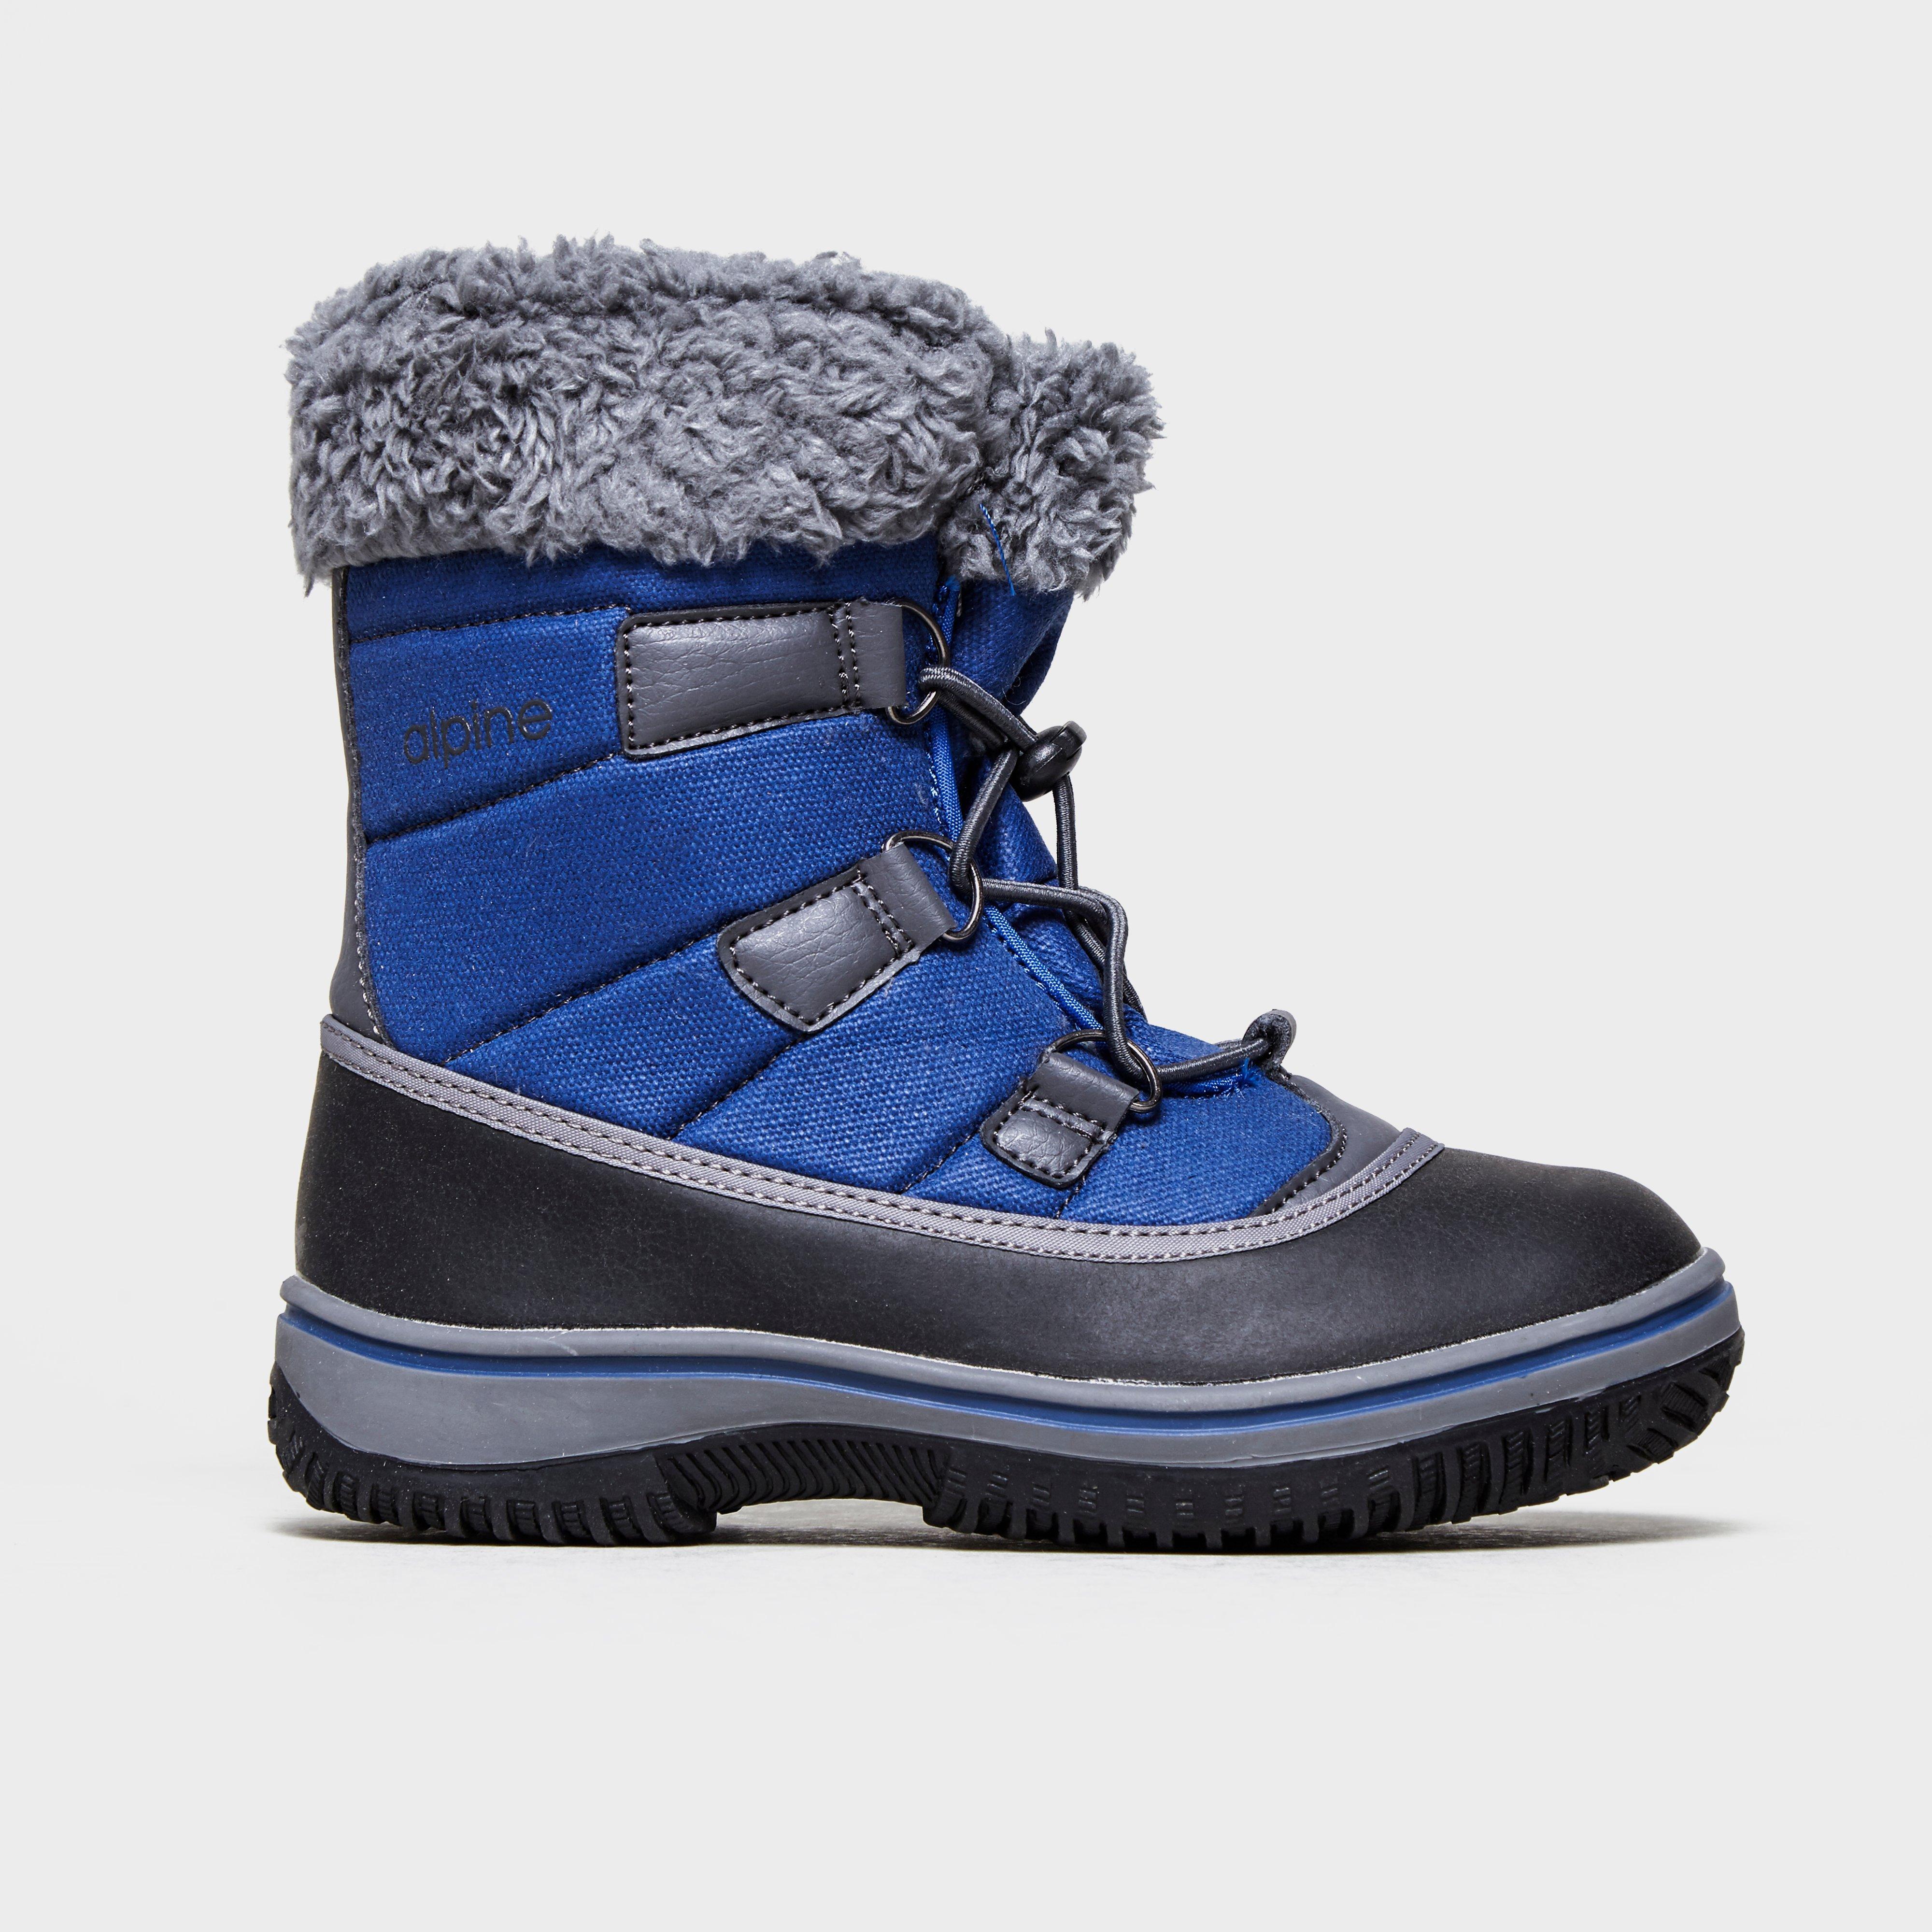 Alpine Boys' Snow Boot, Blue